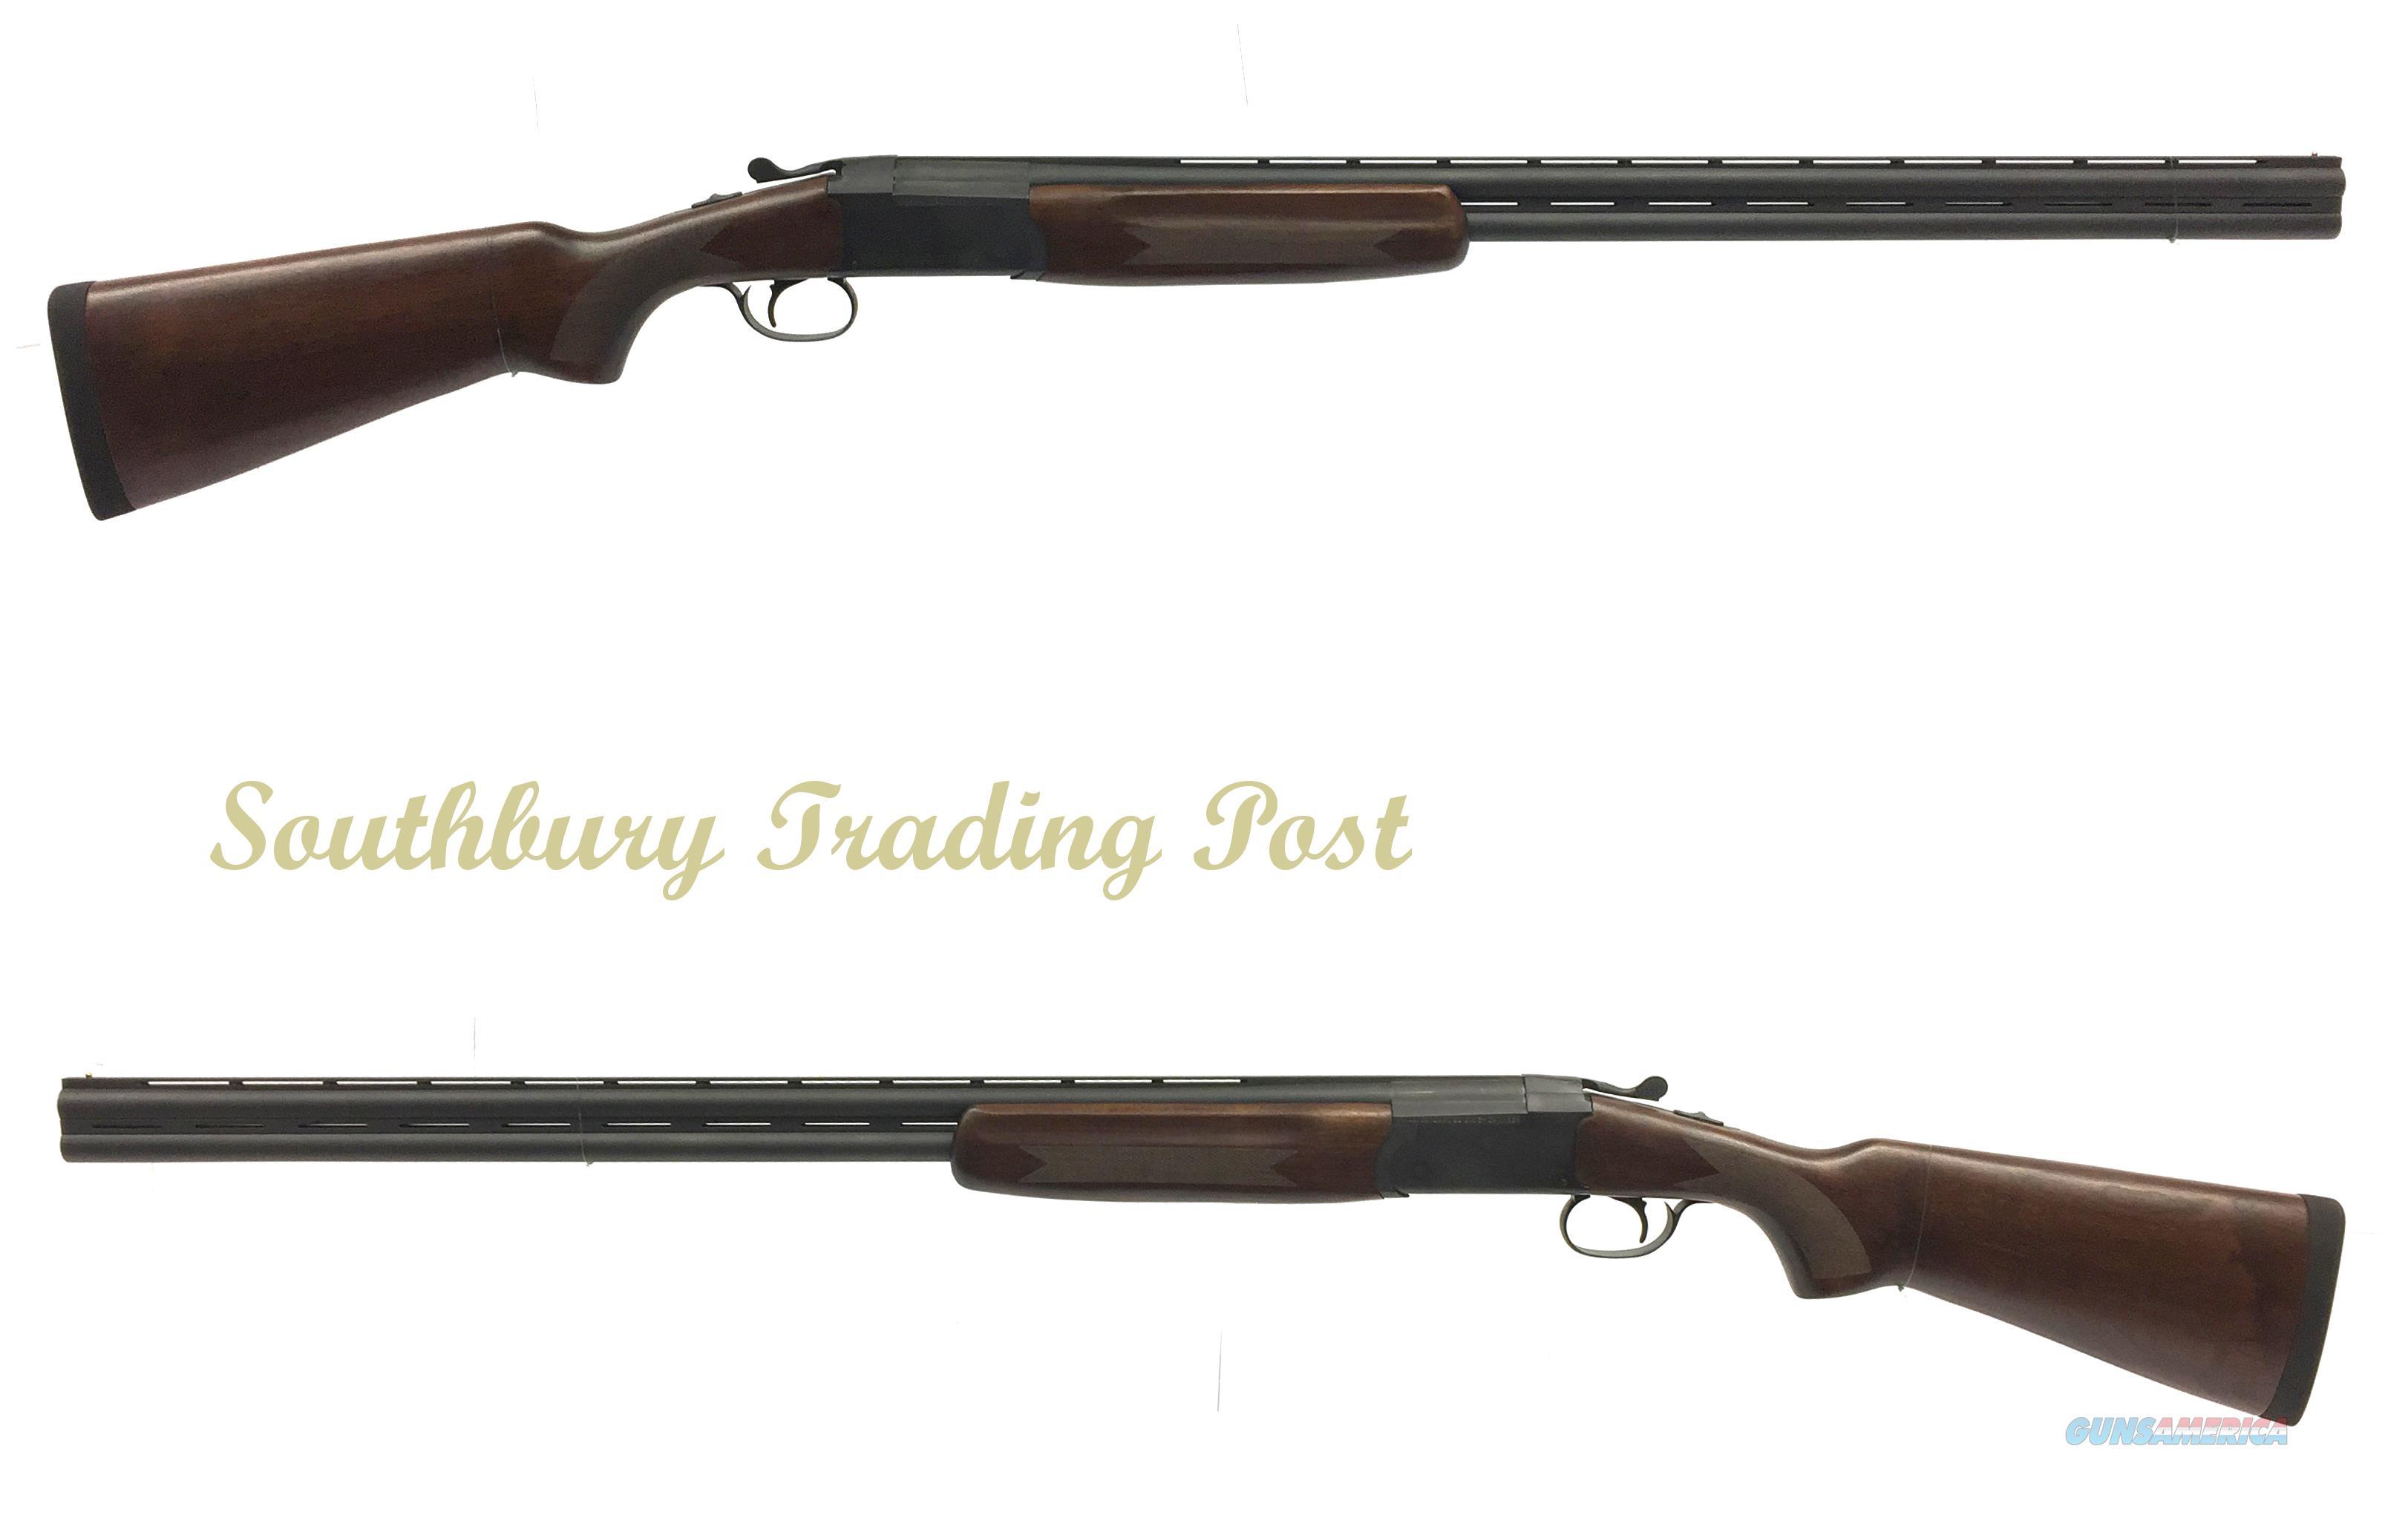 Stoeger 20GA Fowler Condor O/U Shotgun  (Price Drop)  Guns > Shotguns > Stoeger Shotguns